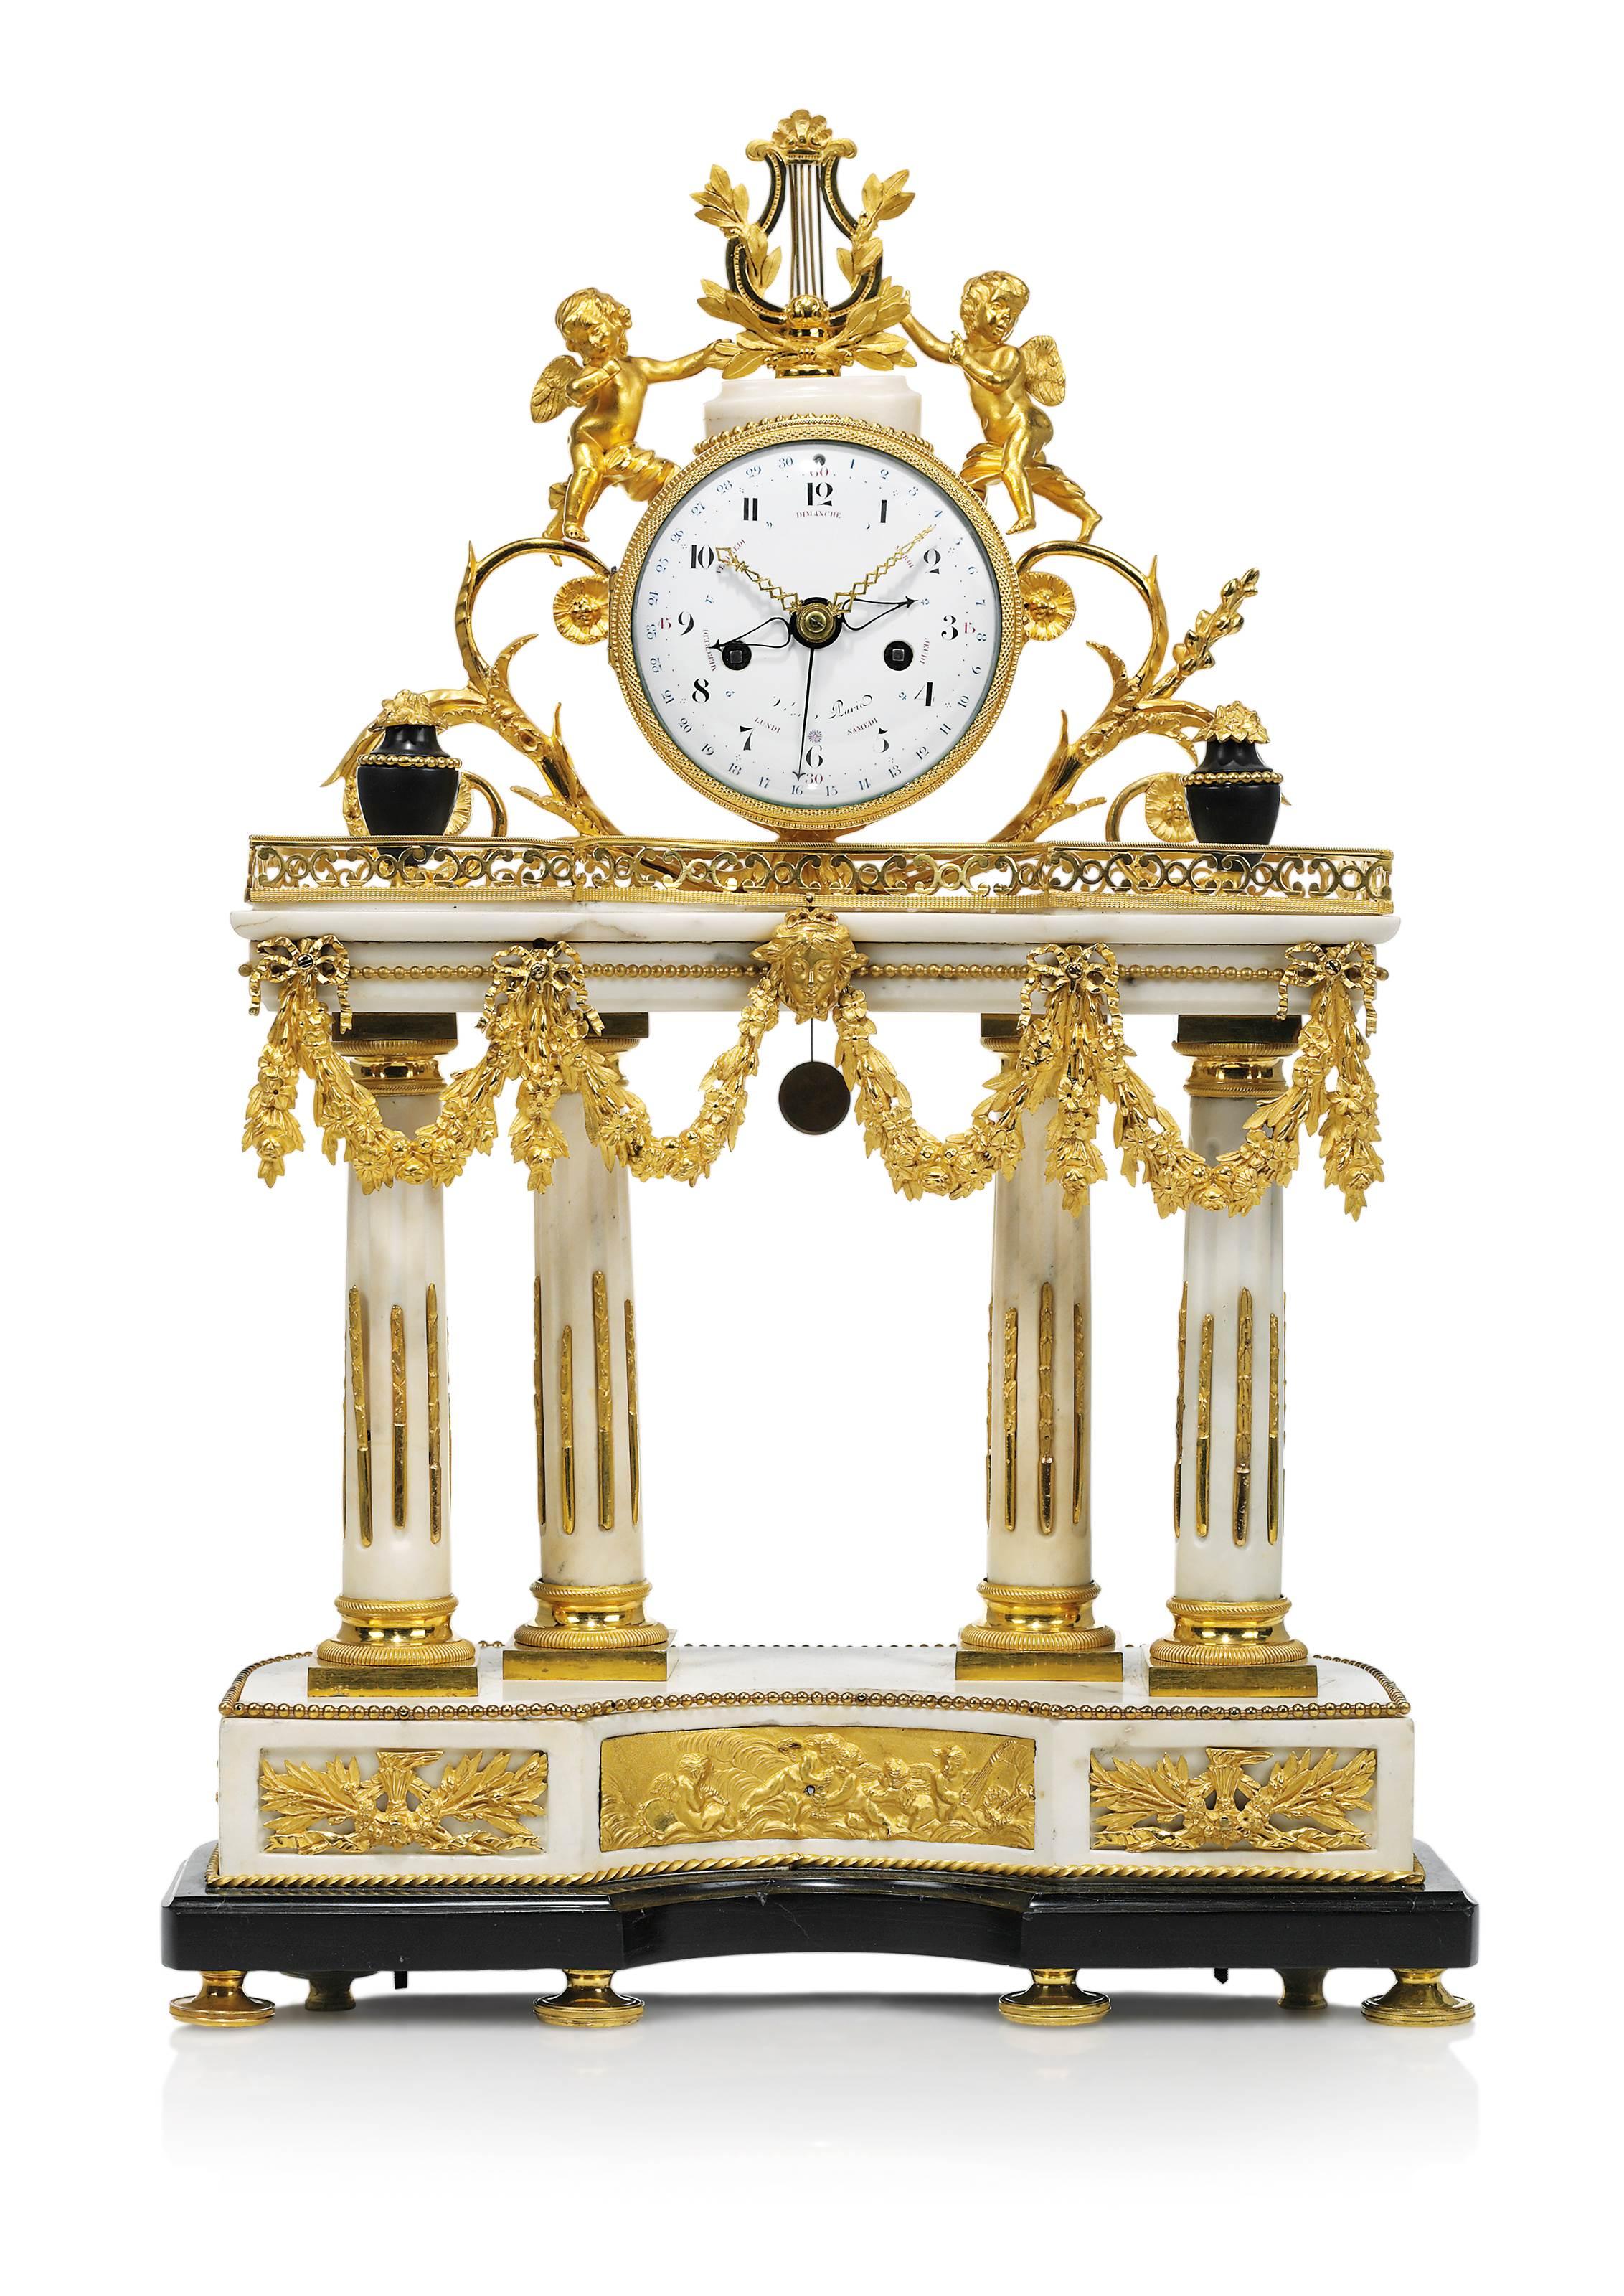 A LOUIS XVI ORMOLU-MOUNTED WHITE MARBLE PORTICO MANTEL CLOCK